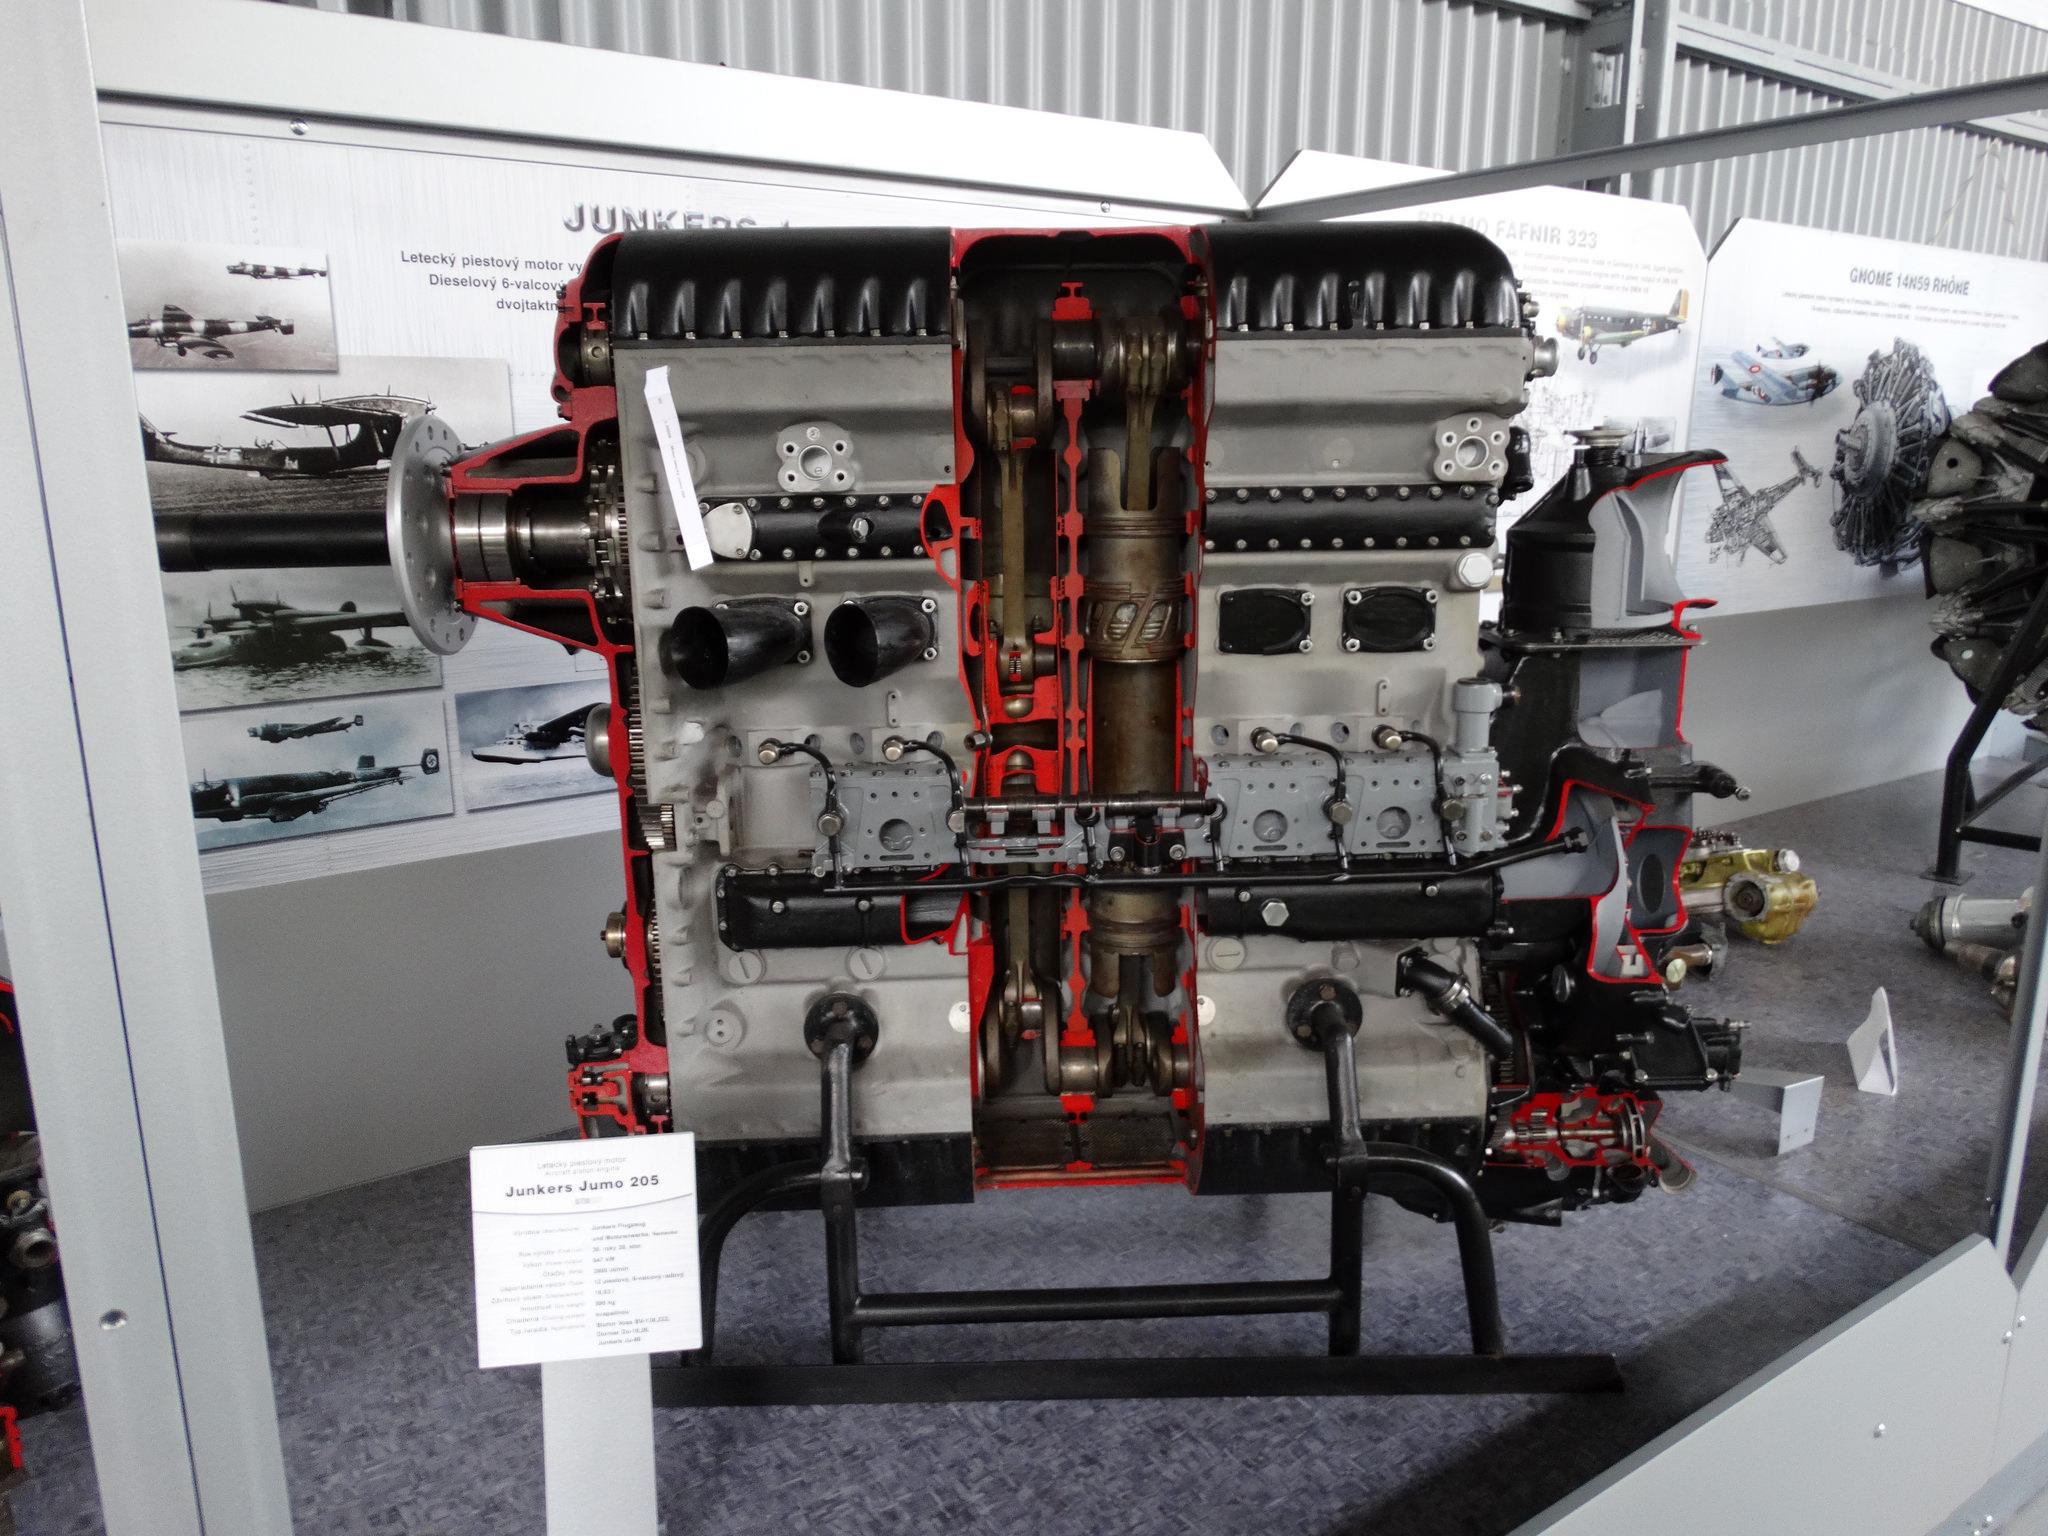 Авиационен дизелов двигател Jumo 205